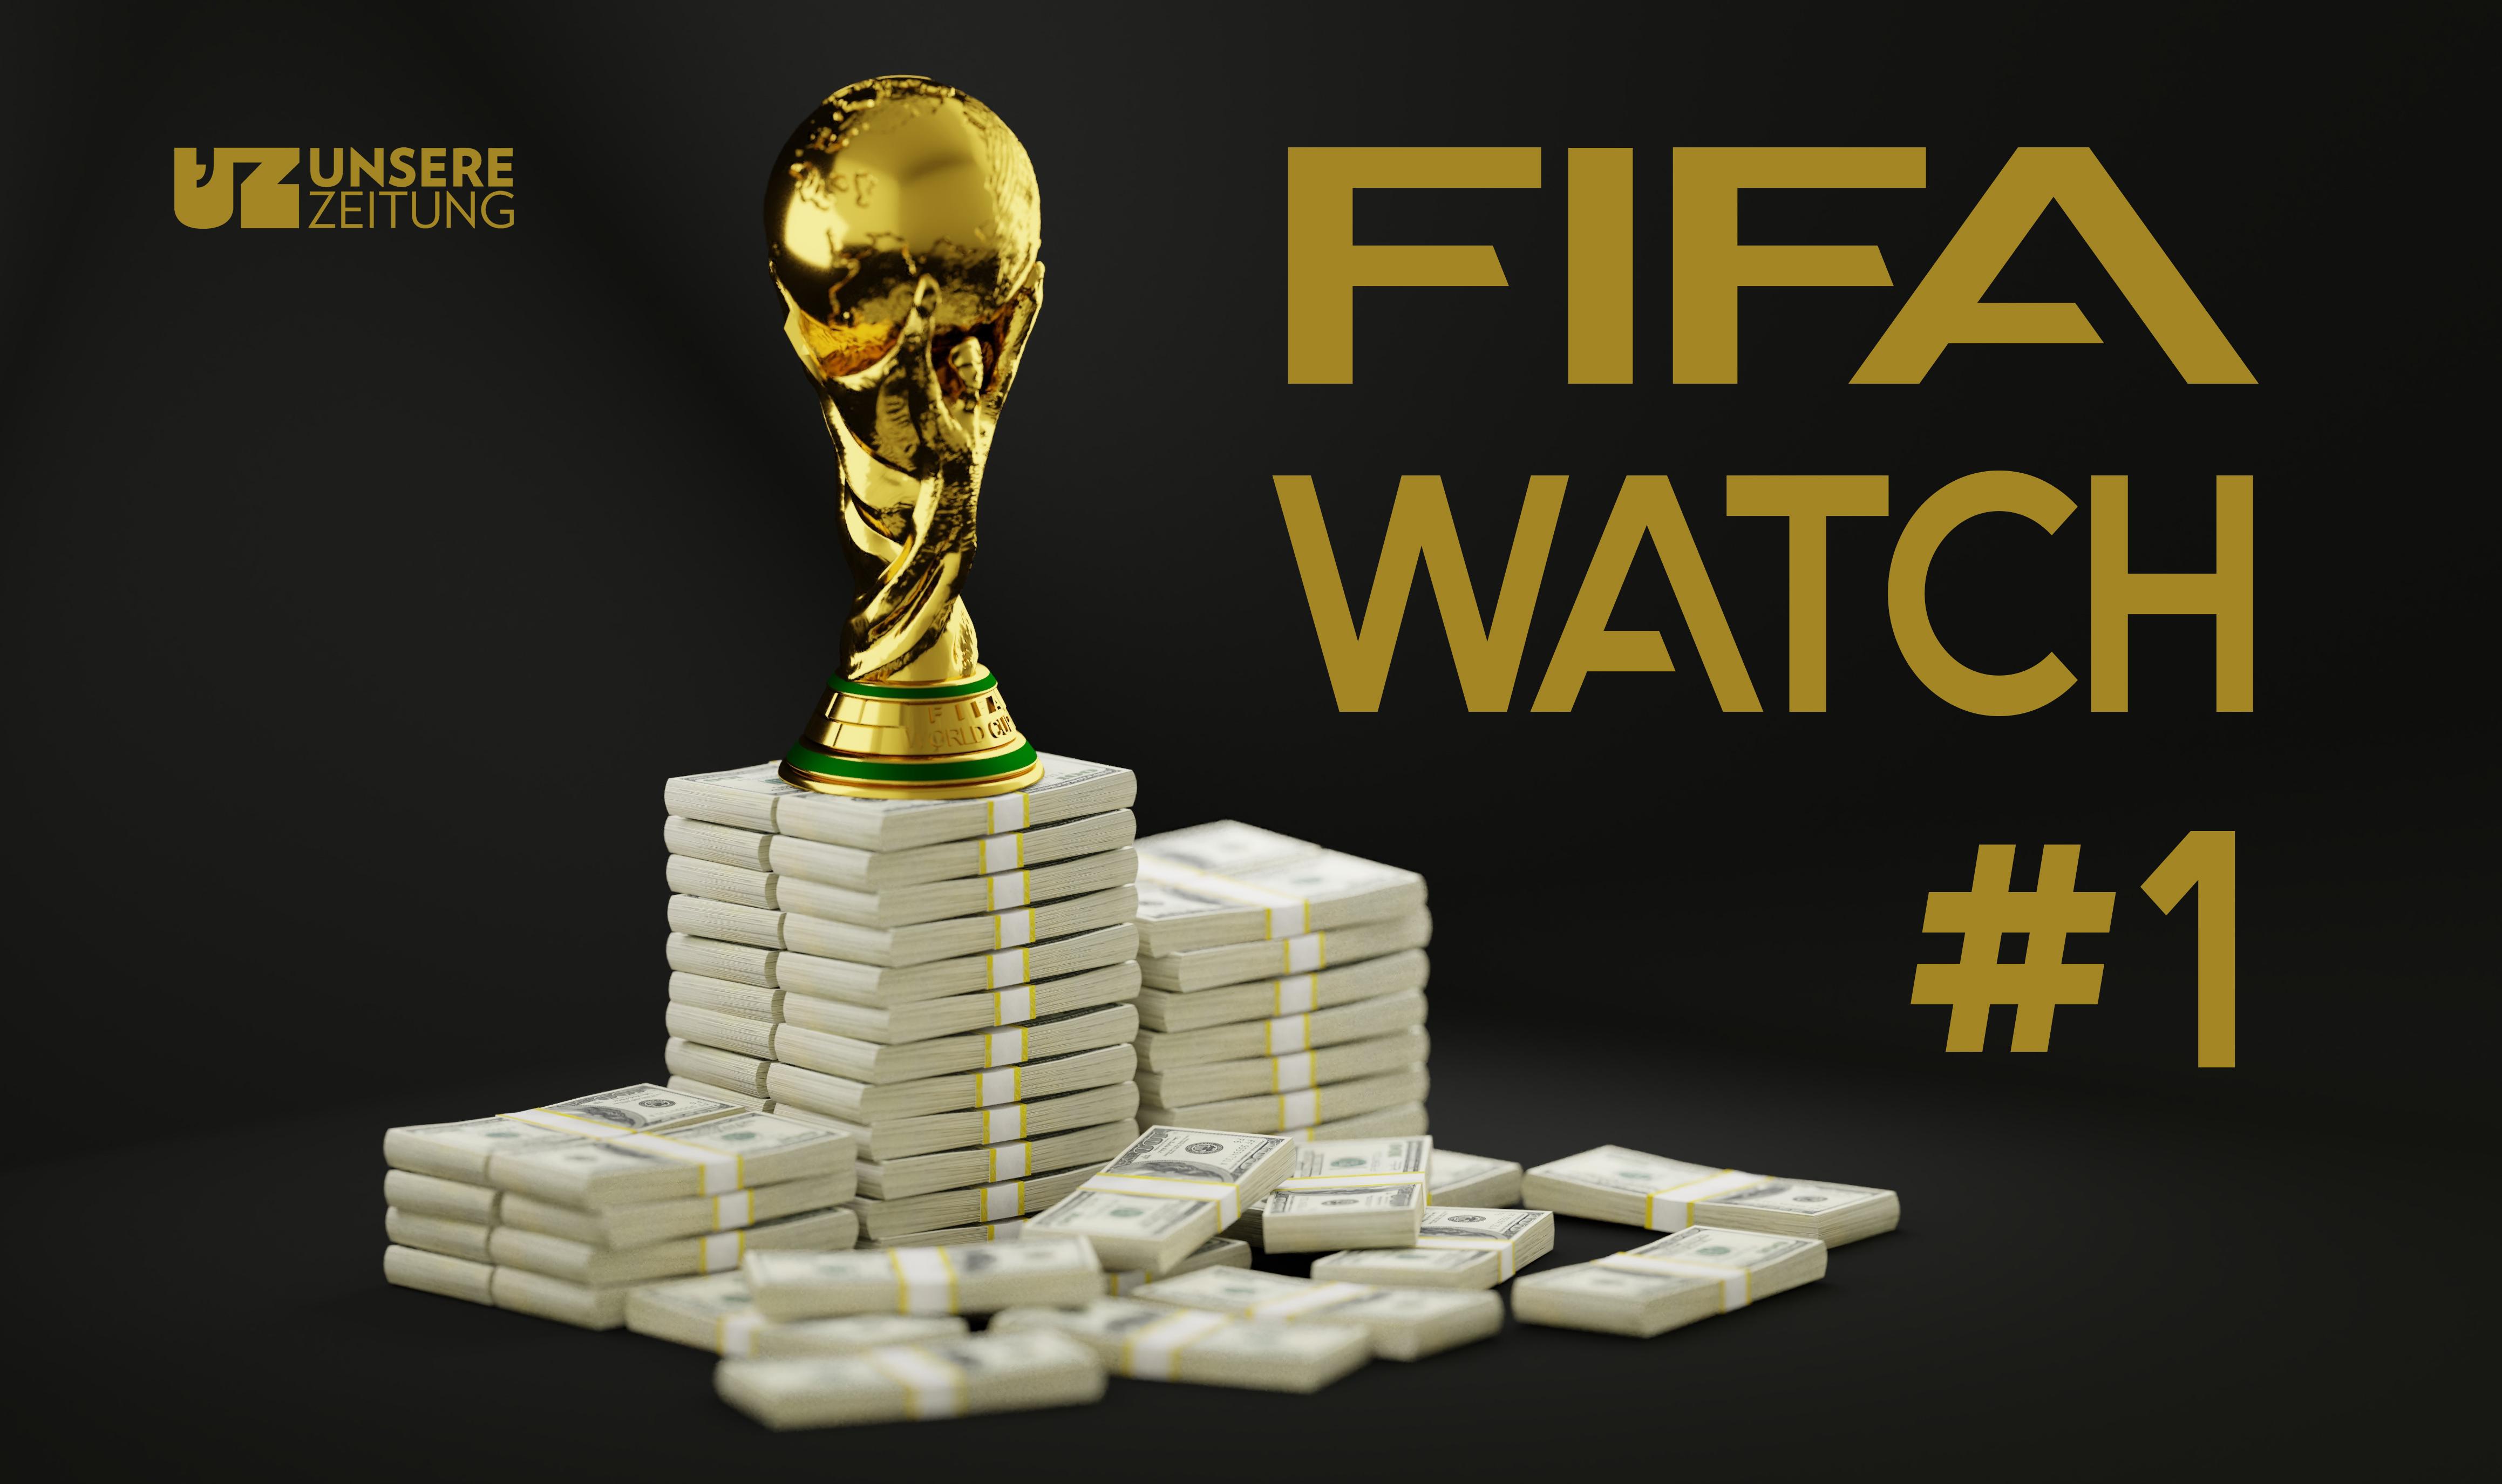 FIFA WATCH #1